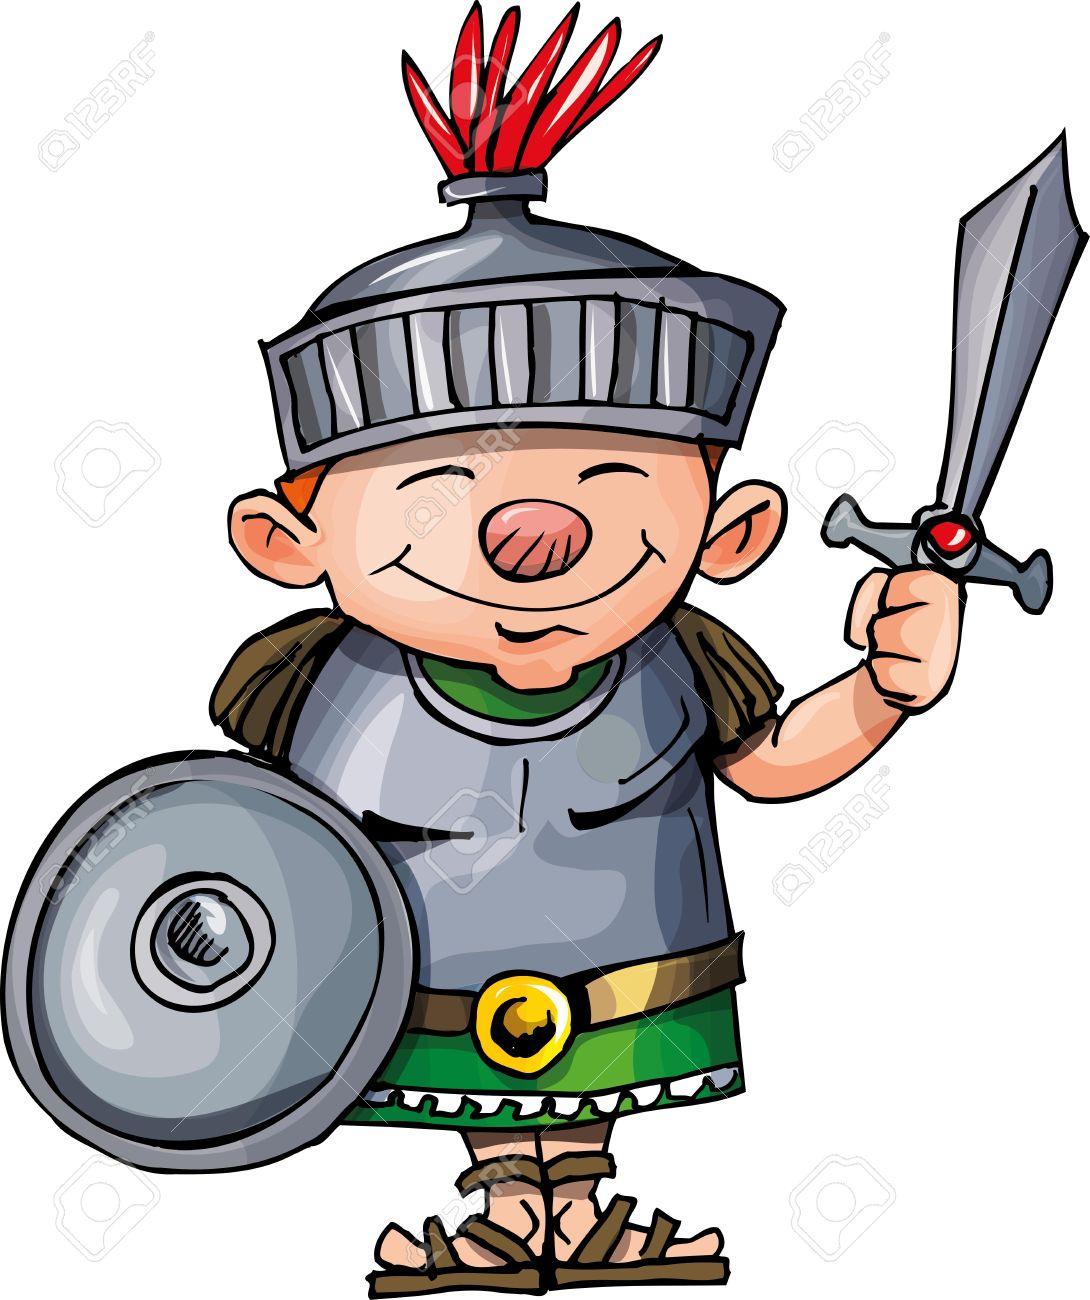 Cartoon Roman legionary with sword and shield. Isolated on white Stock Vector - 9630590